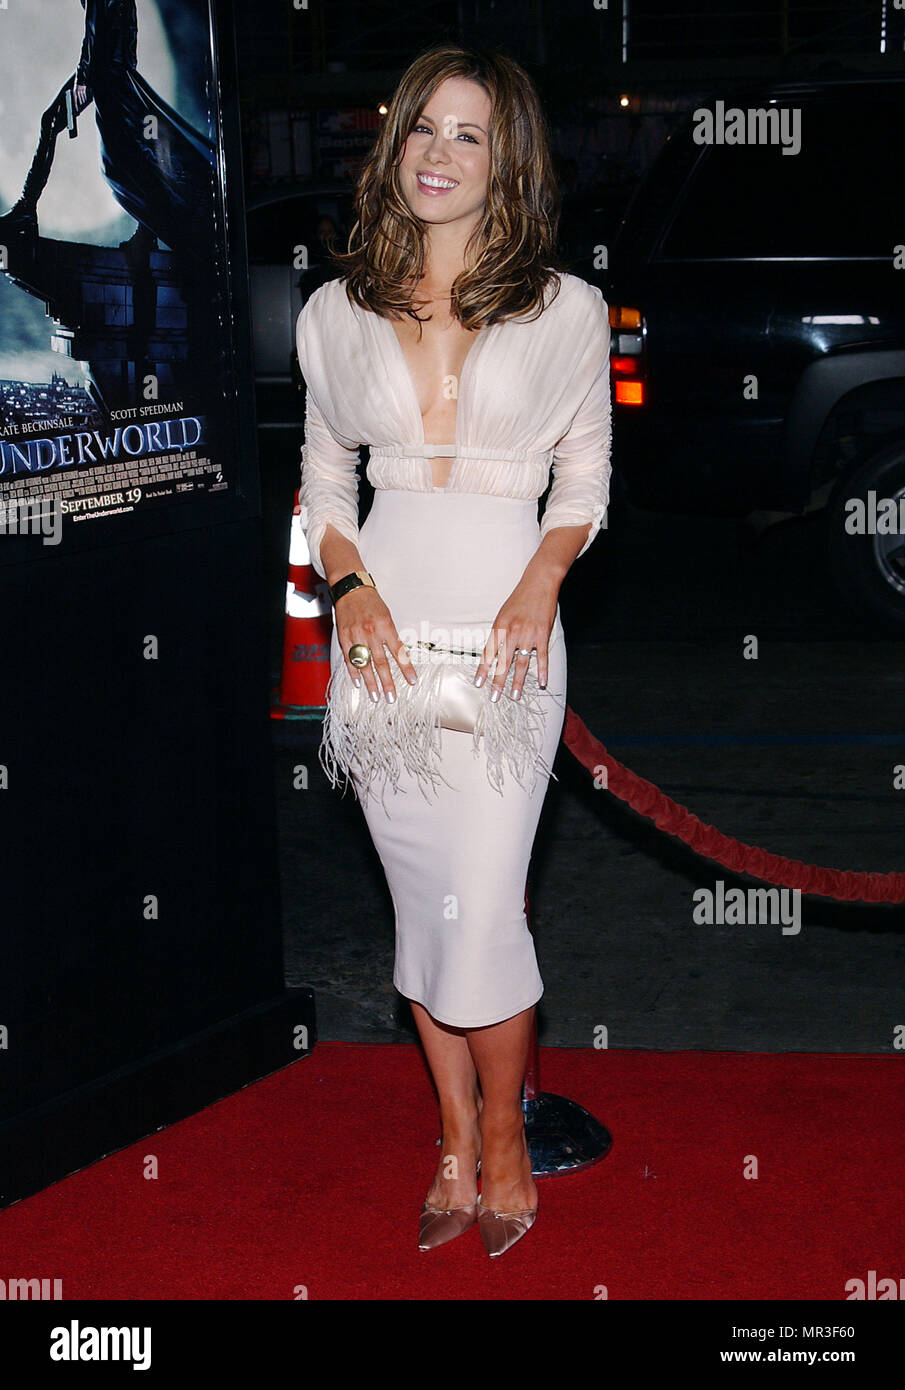 e8e467d35cf Kate Beckinsale arriving at the